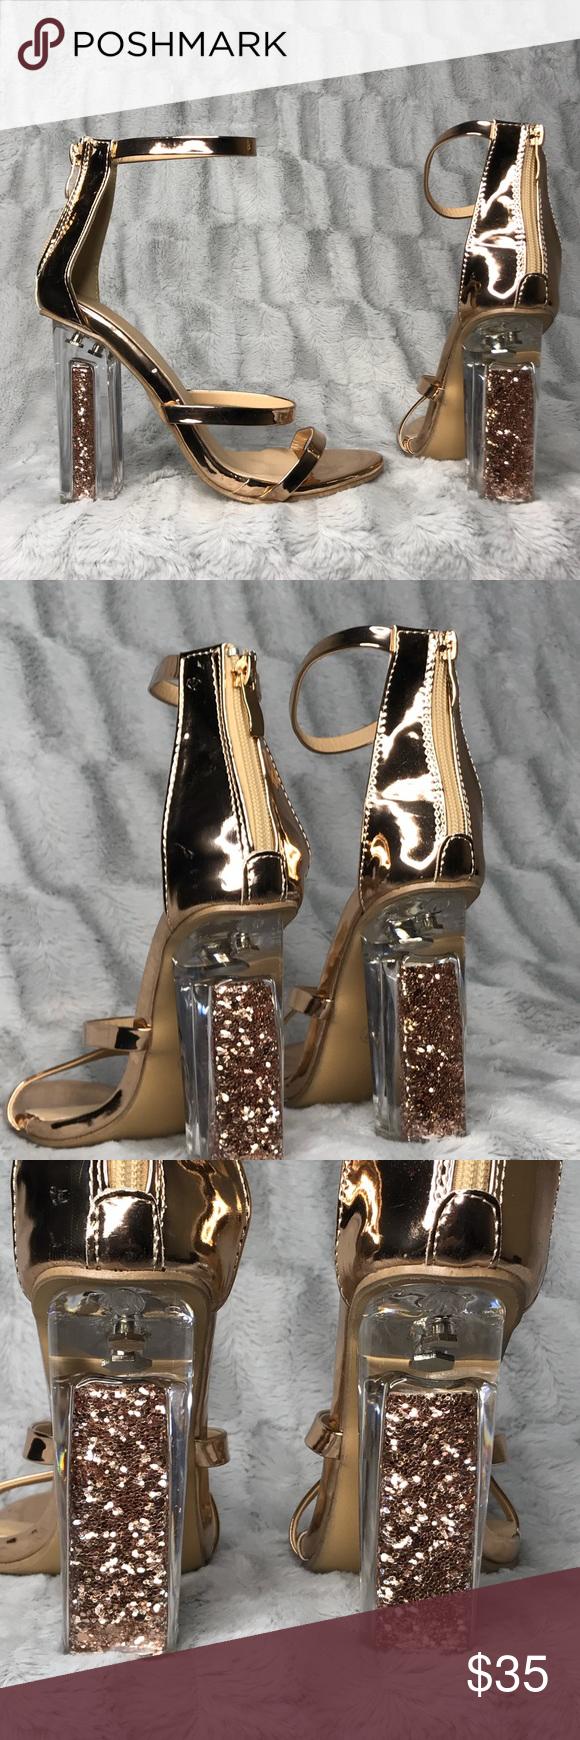 45dddd9ded2 DiJi Girls Glitter Clear Rose Gold Strappy Heels DiJi Girls Glitter Clear  Metallic Rose Gold Strappy